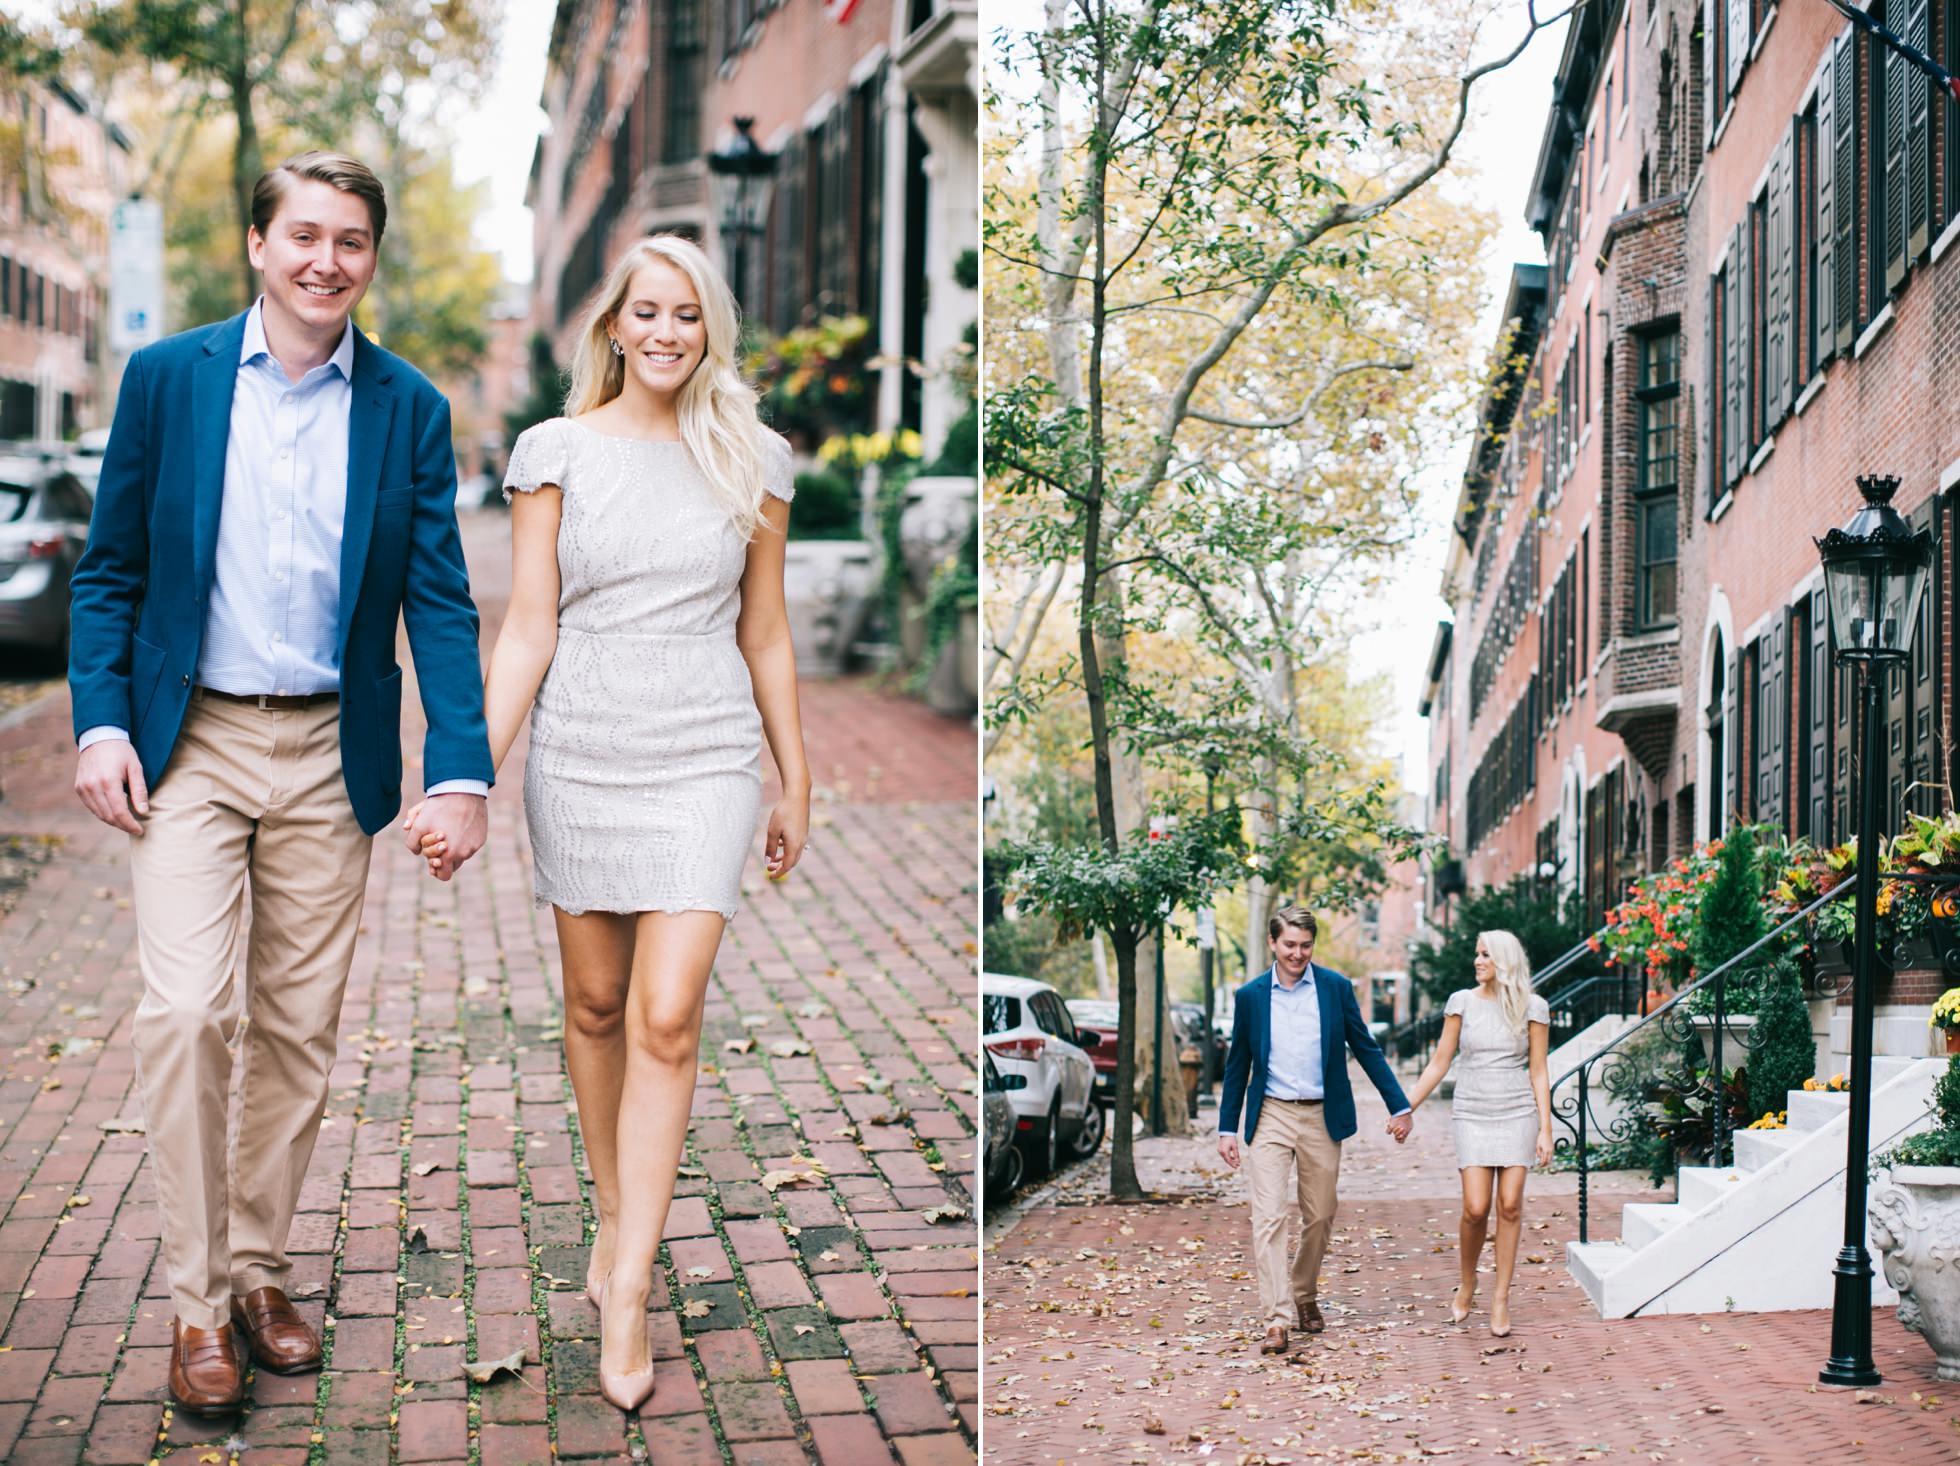 Jessica & Tim - Trendy Preppy Rittenhouse Parc Engagemenent 2